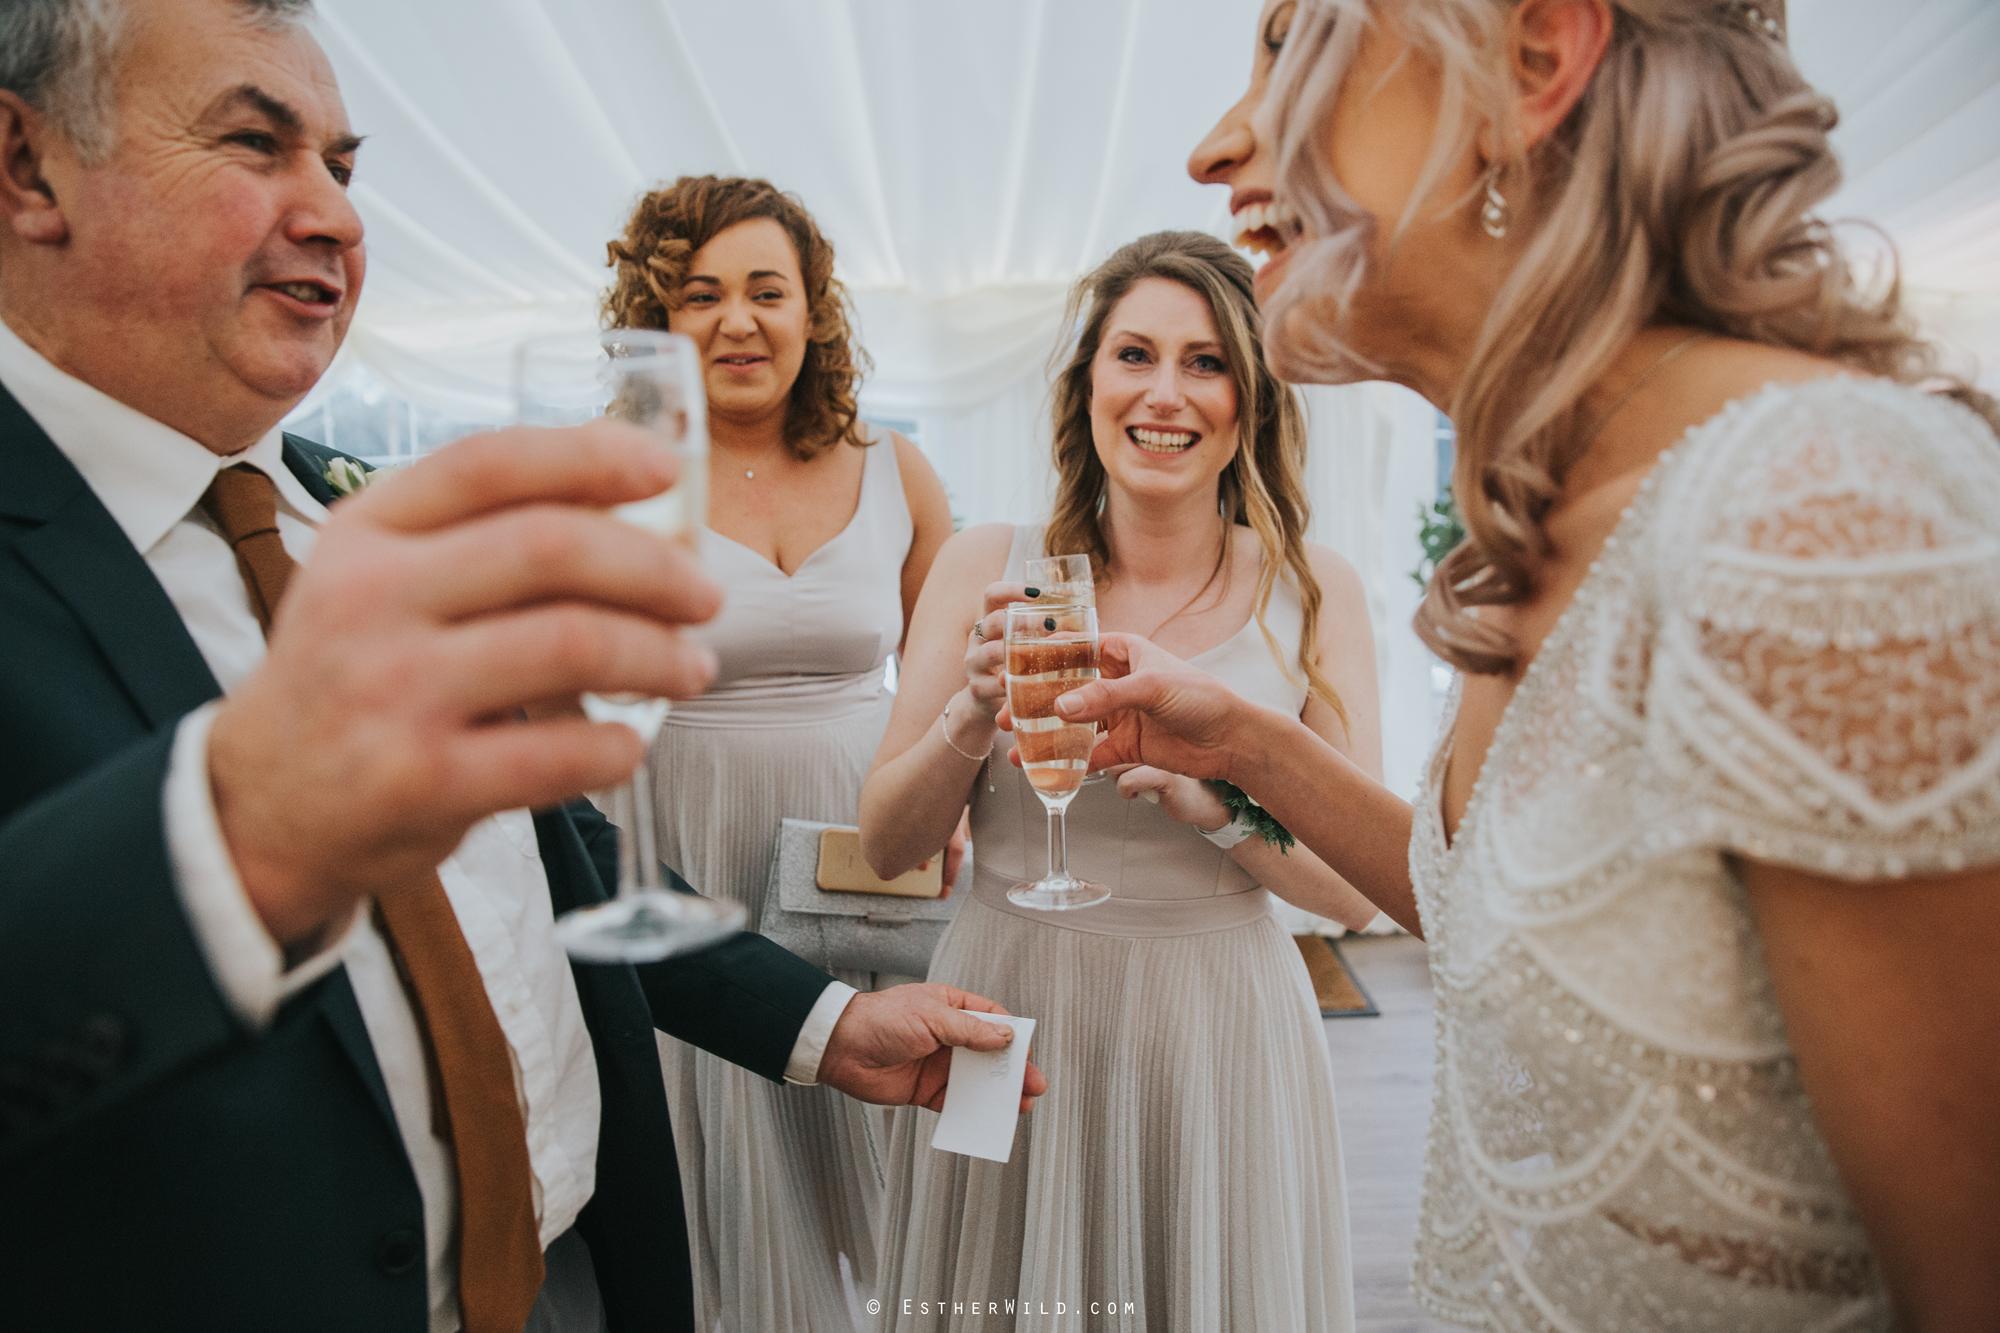 Elms_Barn_Weddings_Suffolk_Photographer_Copyright_Esther_Wild_IMG_1431.jpg